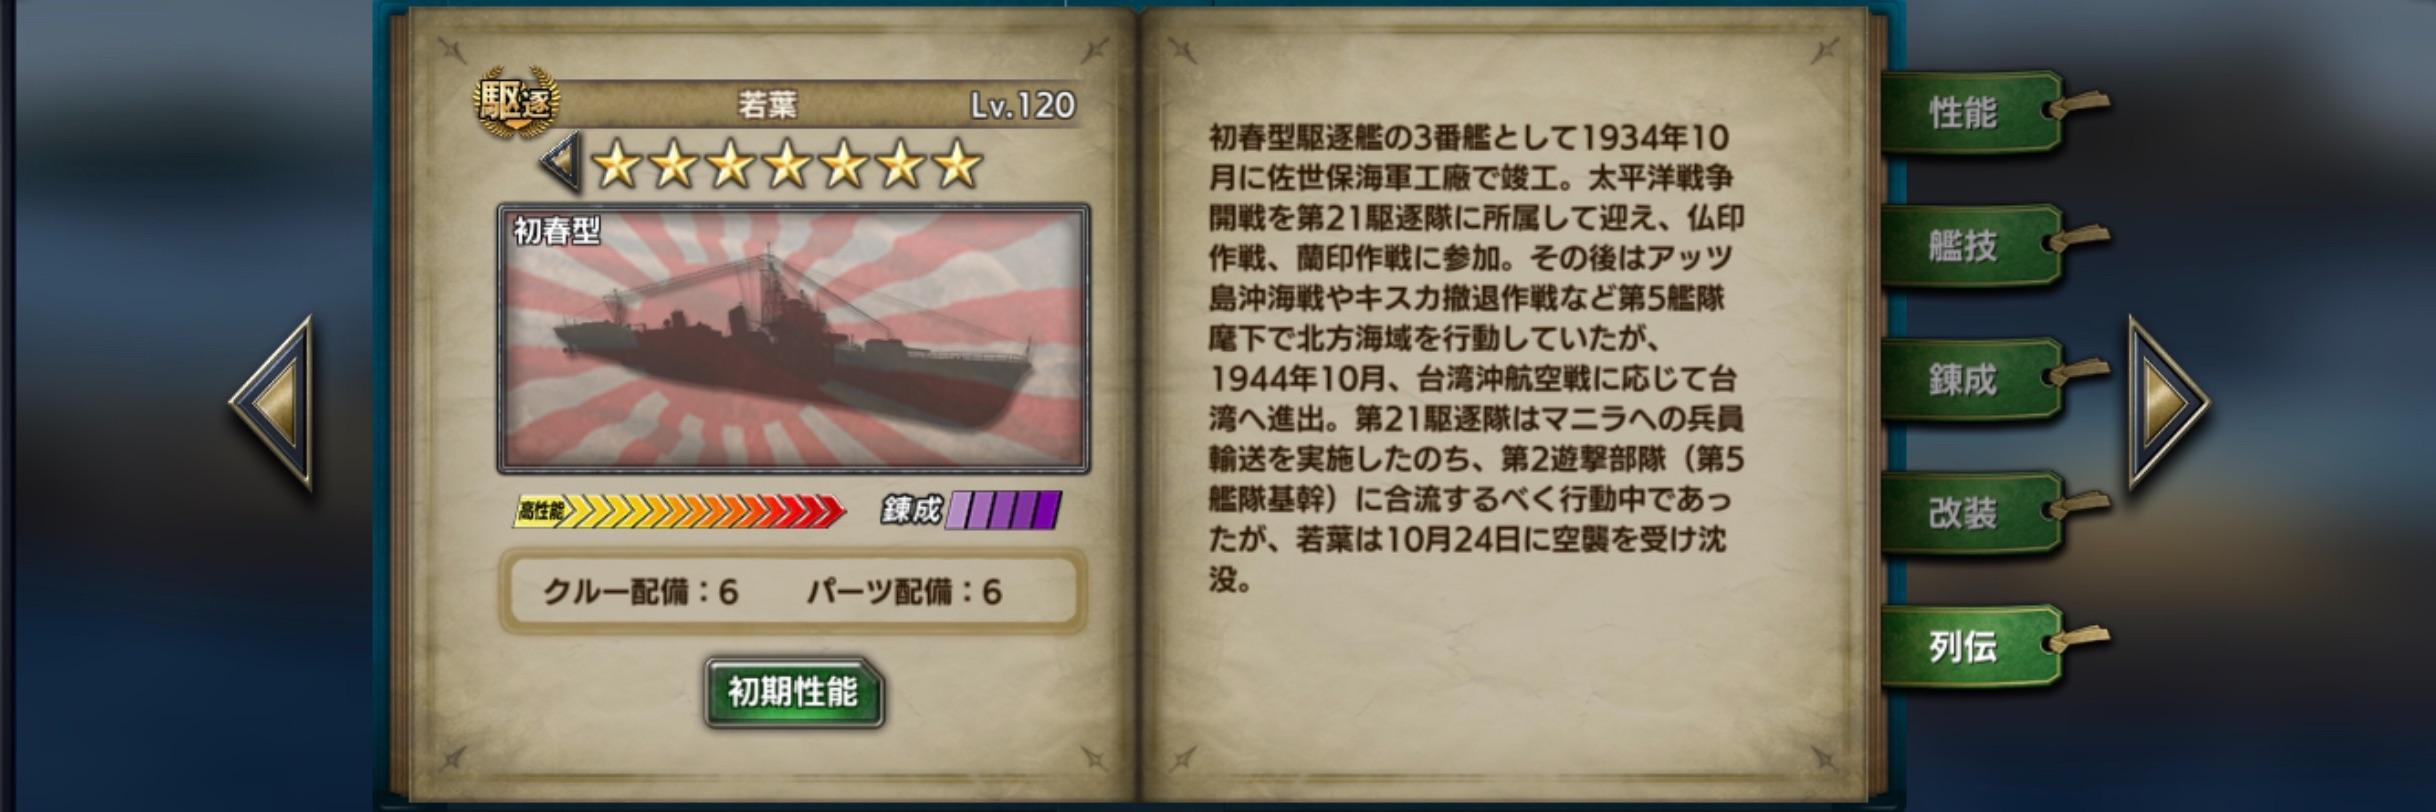 Wakaba-history